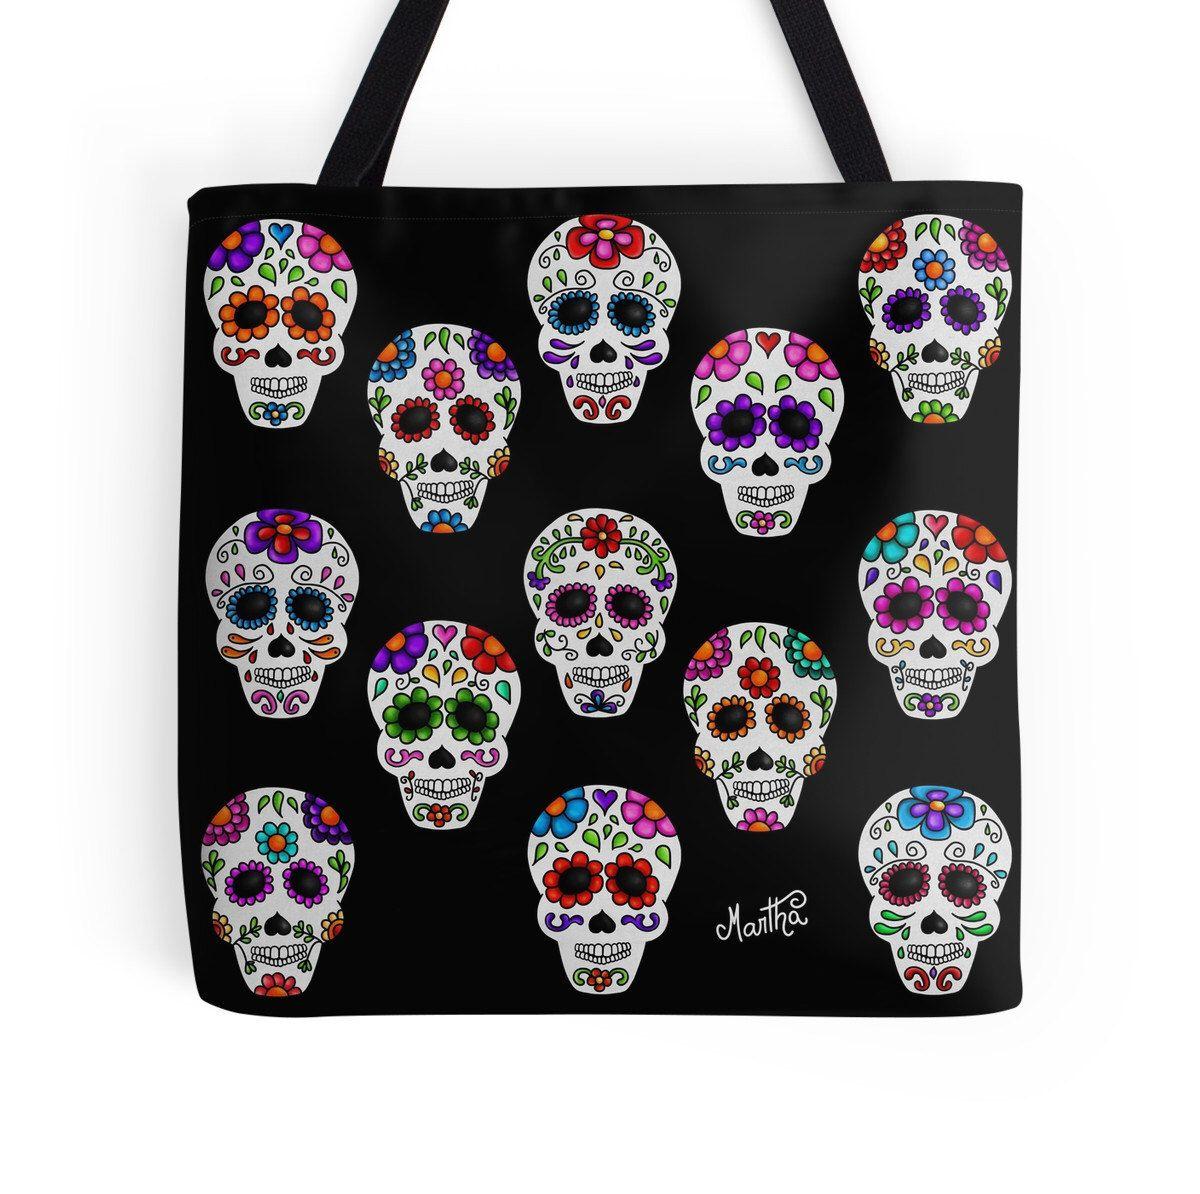 Martha mexican skulls (calacas) Tote Bag de MarthaDucoingArt en Etsy https://www.etsy.com/es/listing/229208487/martha-mexican-skulls-calacas-tote-bag